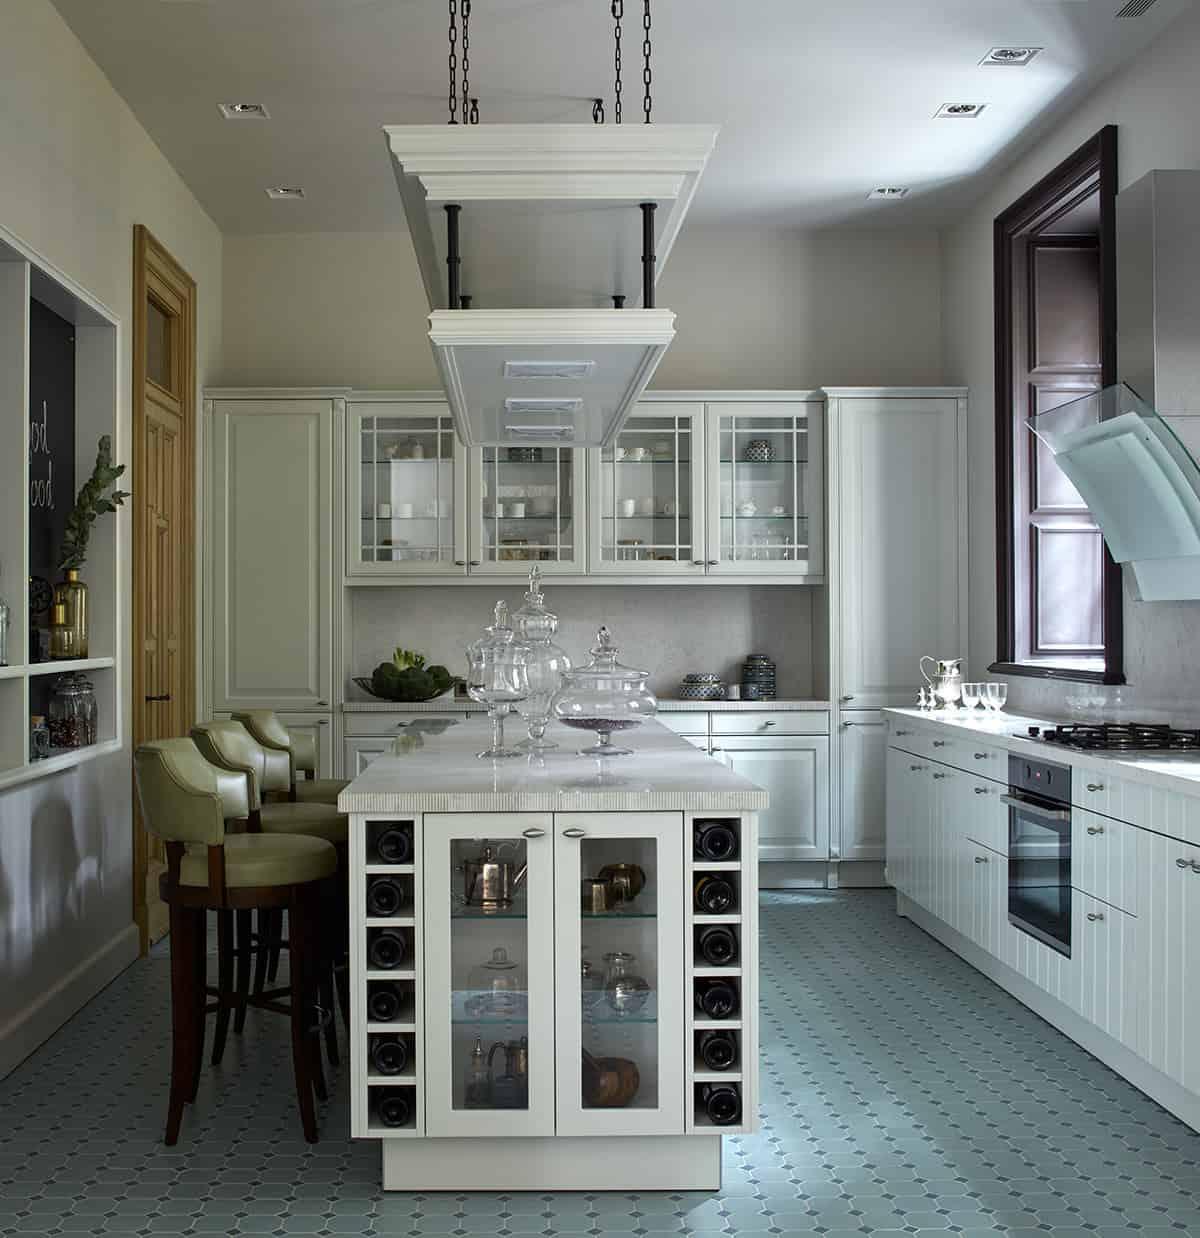 101 Custom Kitchen Design Ideas (2019 Pictures